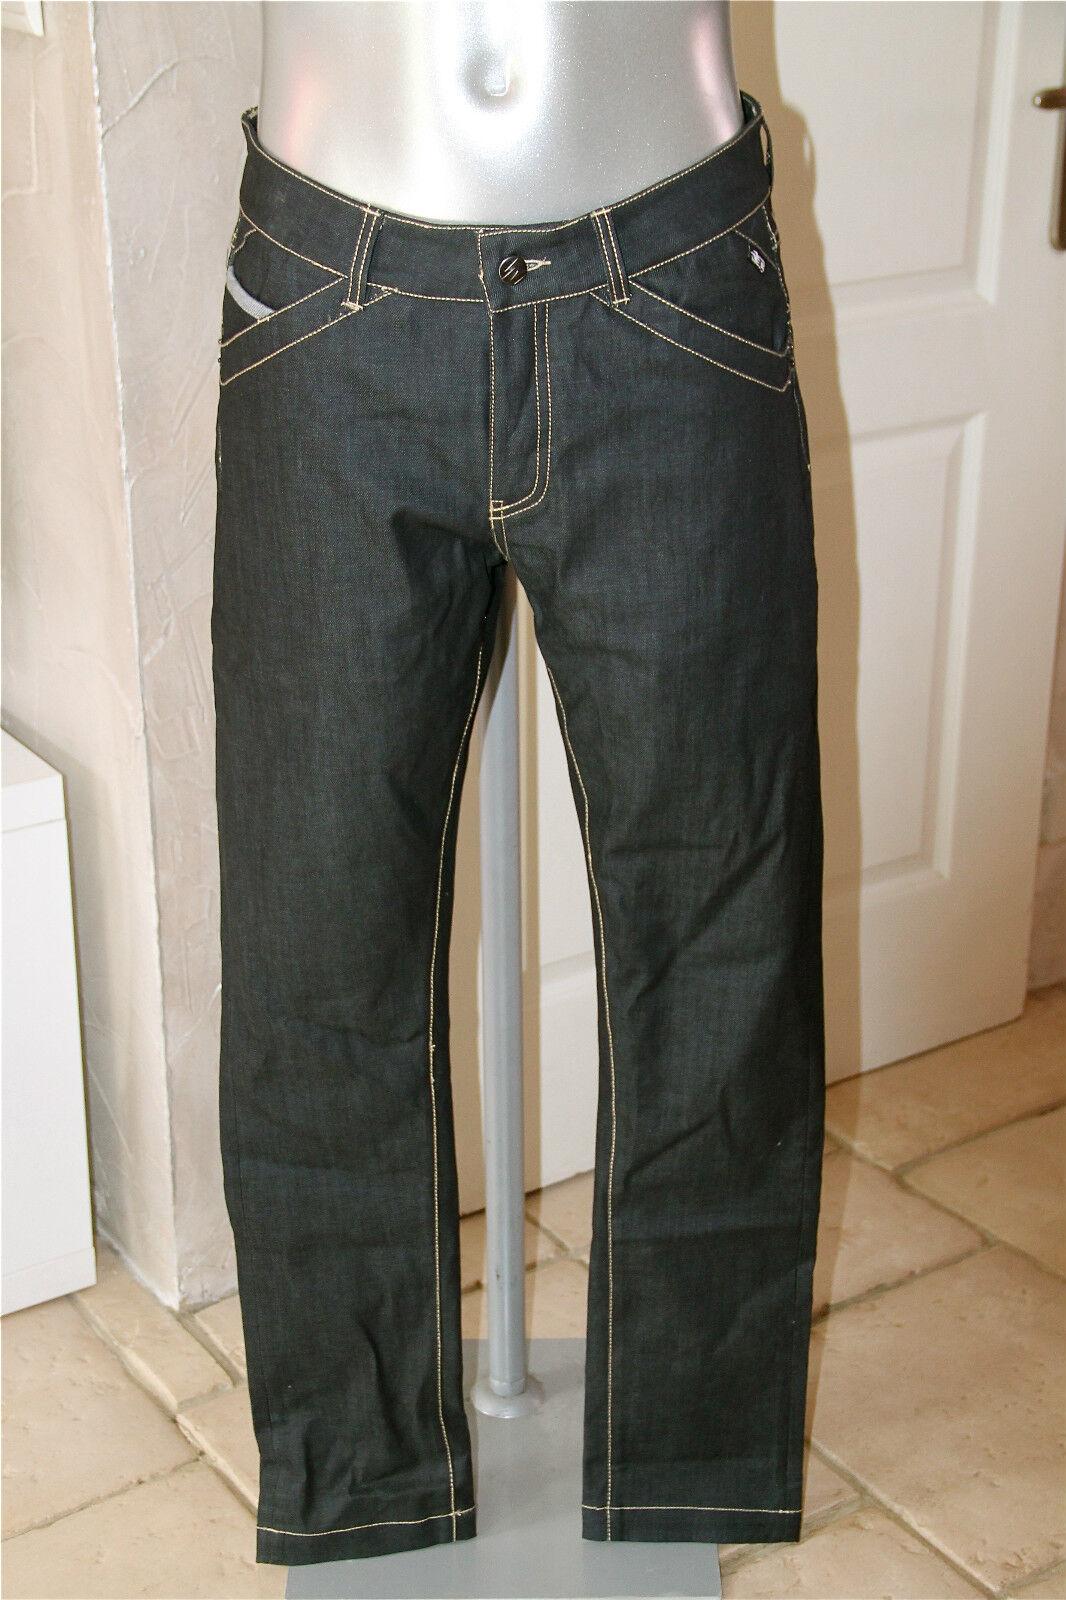 Jeans slim wax man KANABEACH central T 42 NEW LABEL value